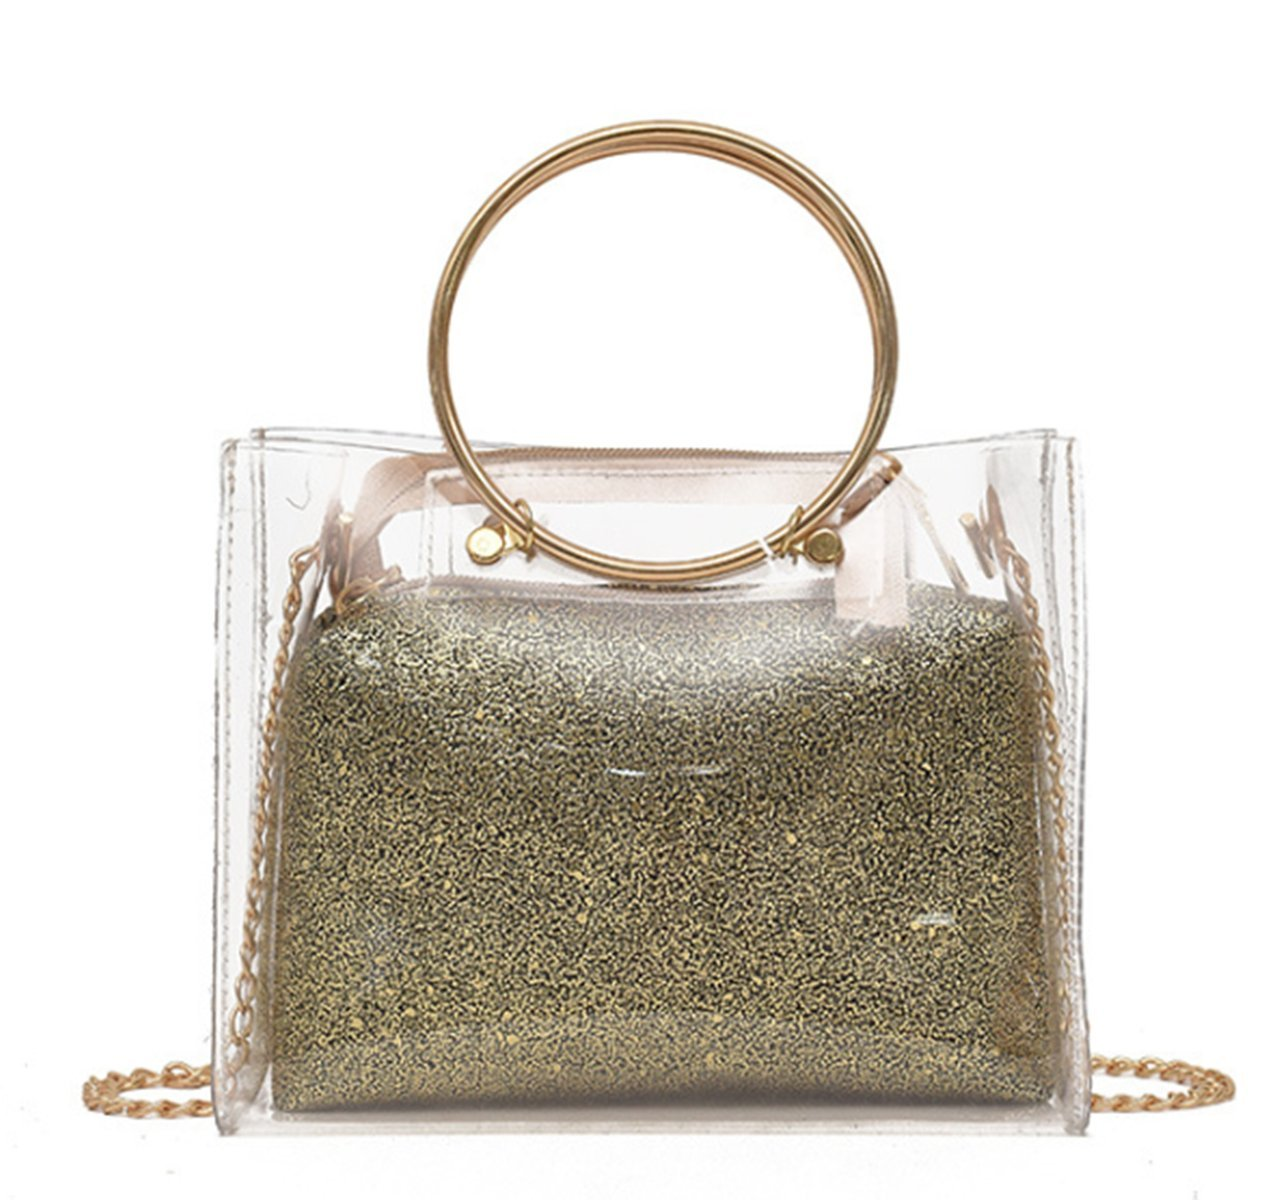 Women's Clear Transparent Metallic Strap Shoulder Crossbody Handbag Clutch with Inner Cosmetic Bag (Gold)